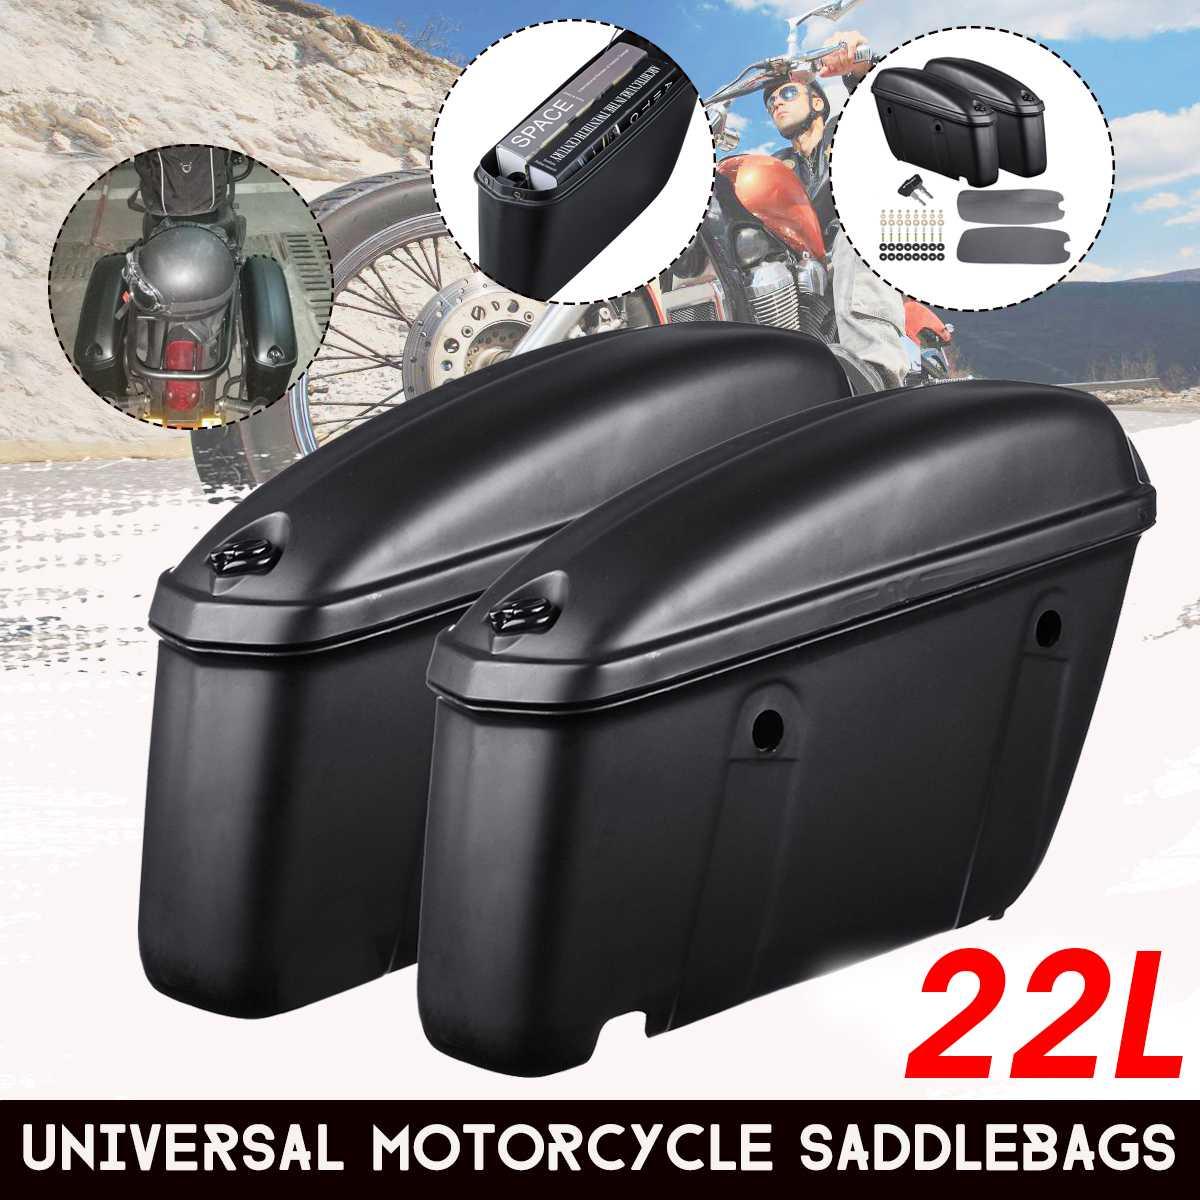 Par 22l motocicleta sela saco tronco caso caixa de bagagem lateral alforjes para suzuki/yamaha/honda